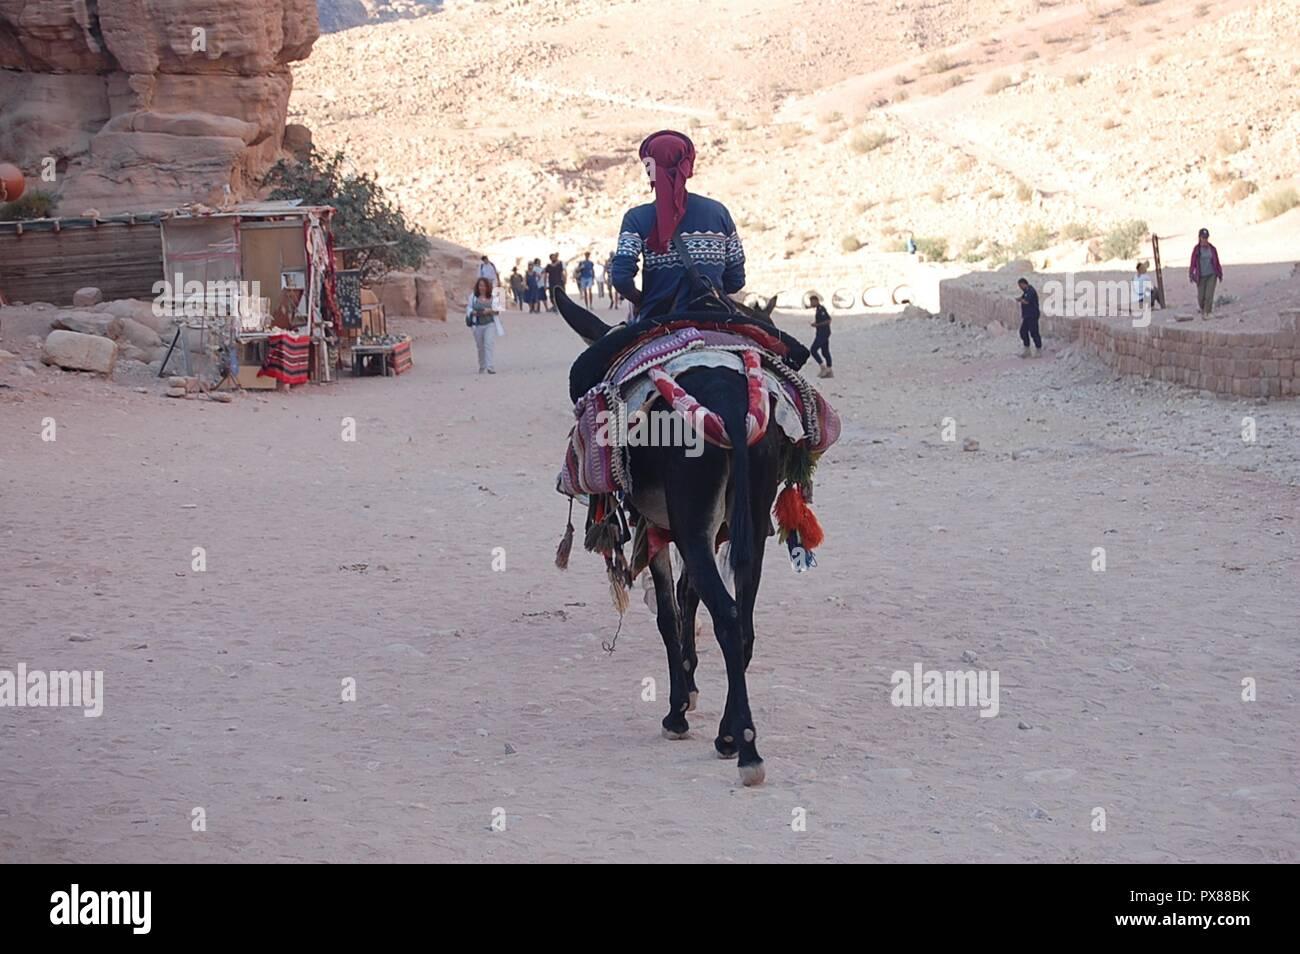 Desert of Petra, Jordan - Stock Image